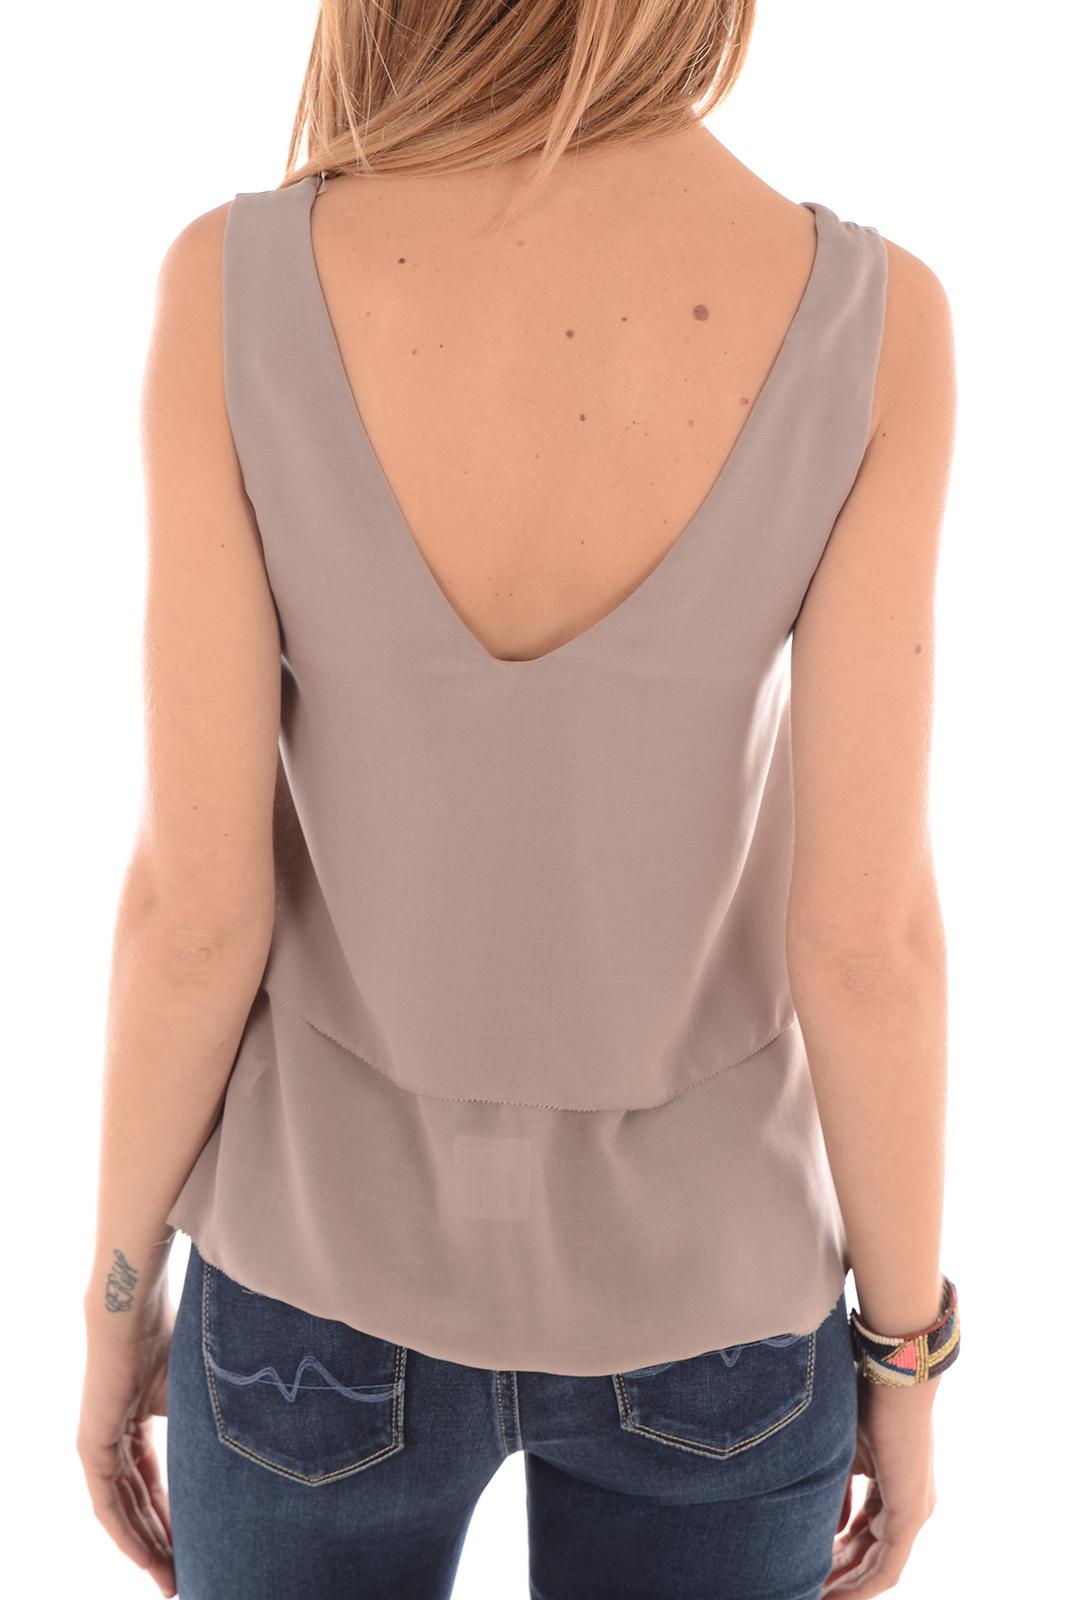 Tops & Tee shirts  Pepe jeans PL301588 NALA 862 LT MINK